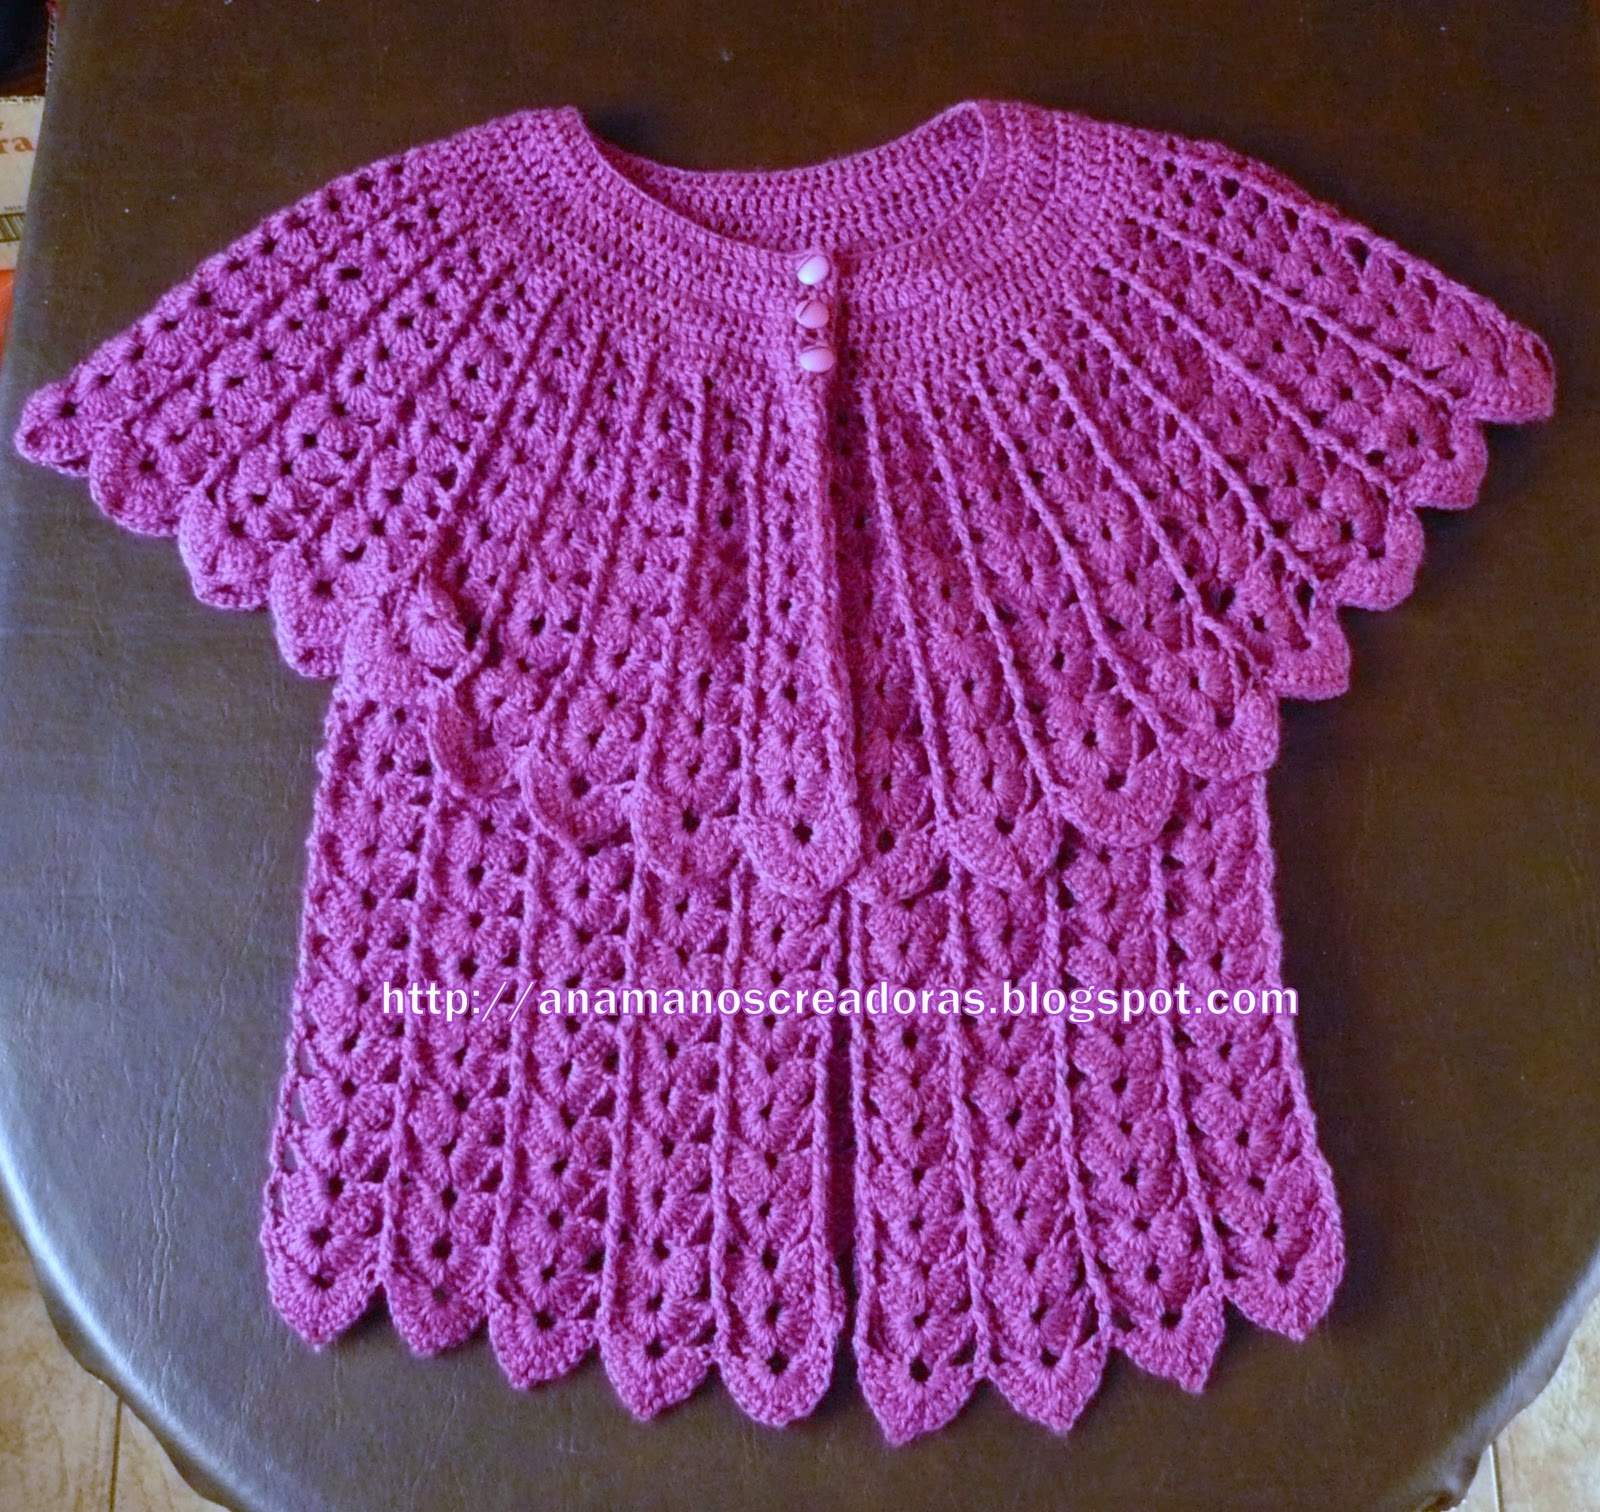 Use Crocheting In A Sentence : ... Tejidos Crochet Patrones Graffiti Tejidos Artesanales Crochet Dos